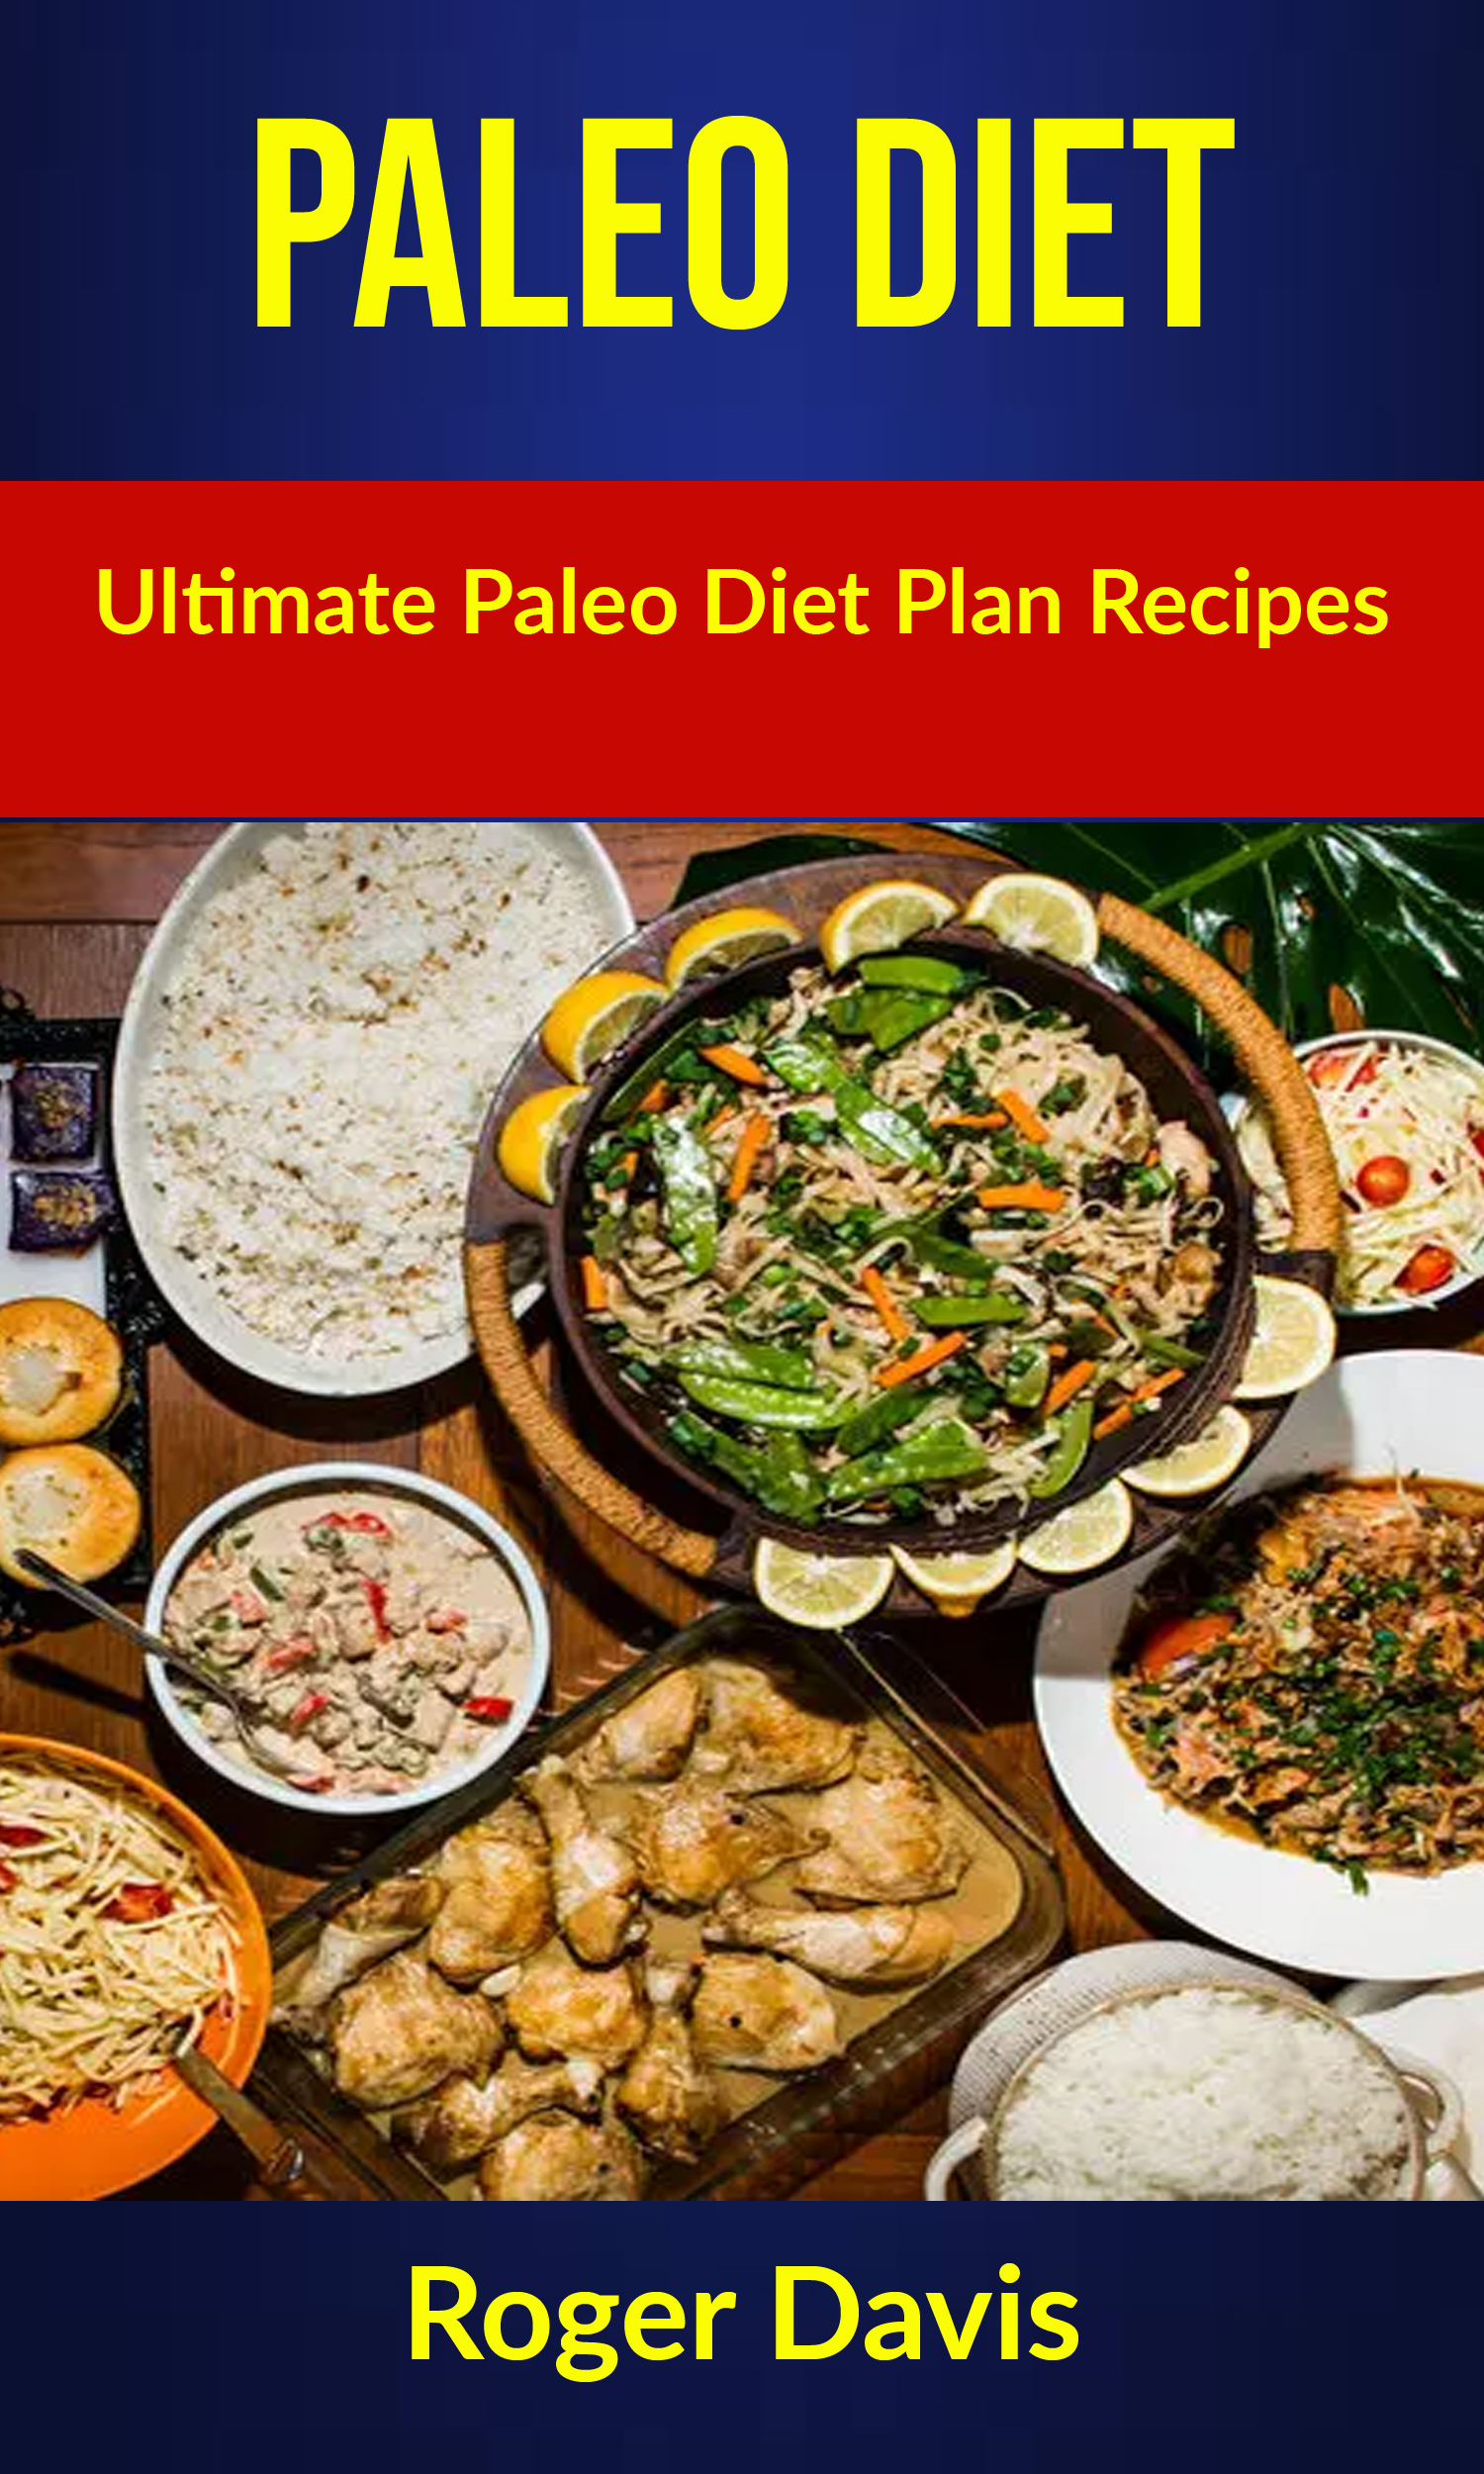 Paleo diet:  ultimate paleo diet plan recipes